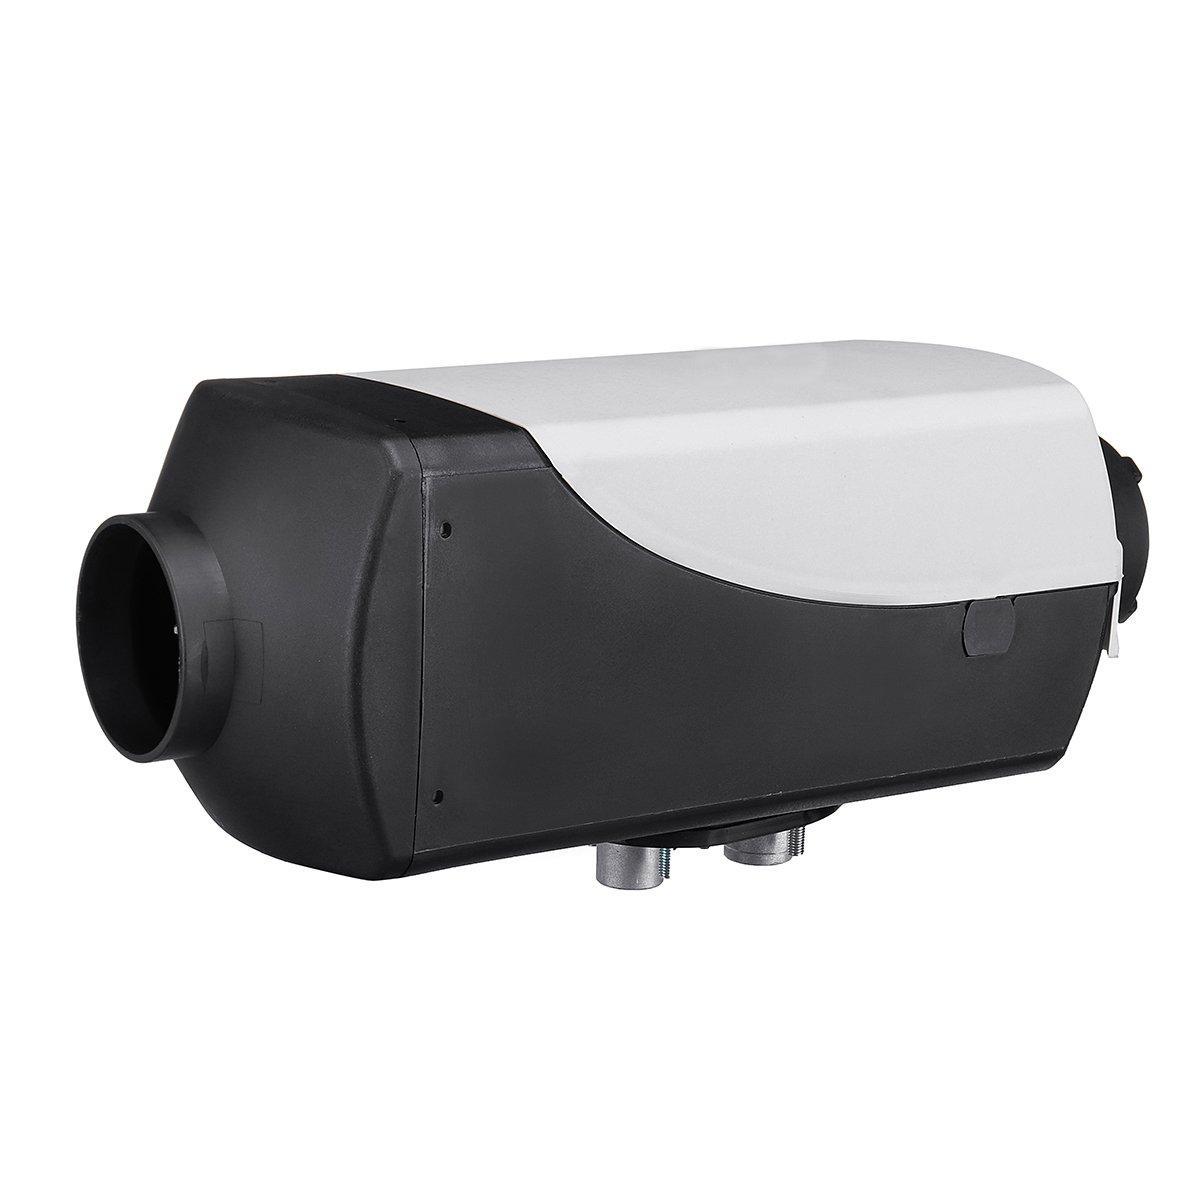 8KW Remote Control 12V LCD Silencer Parking Heater Air Parking Heating Machinie Diesel Air Heater Kit